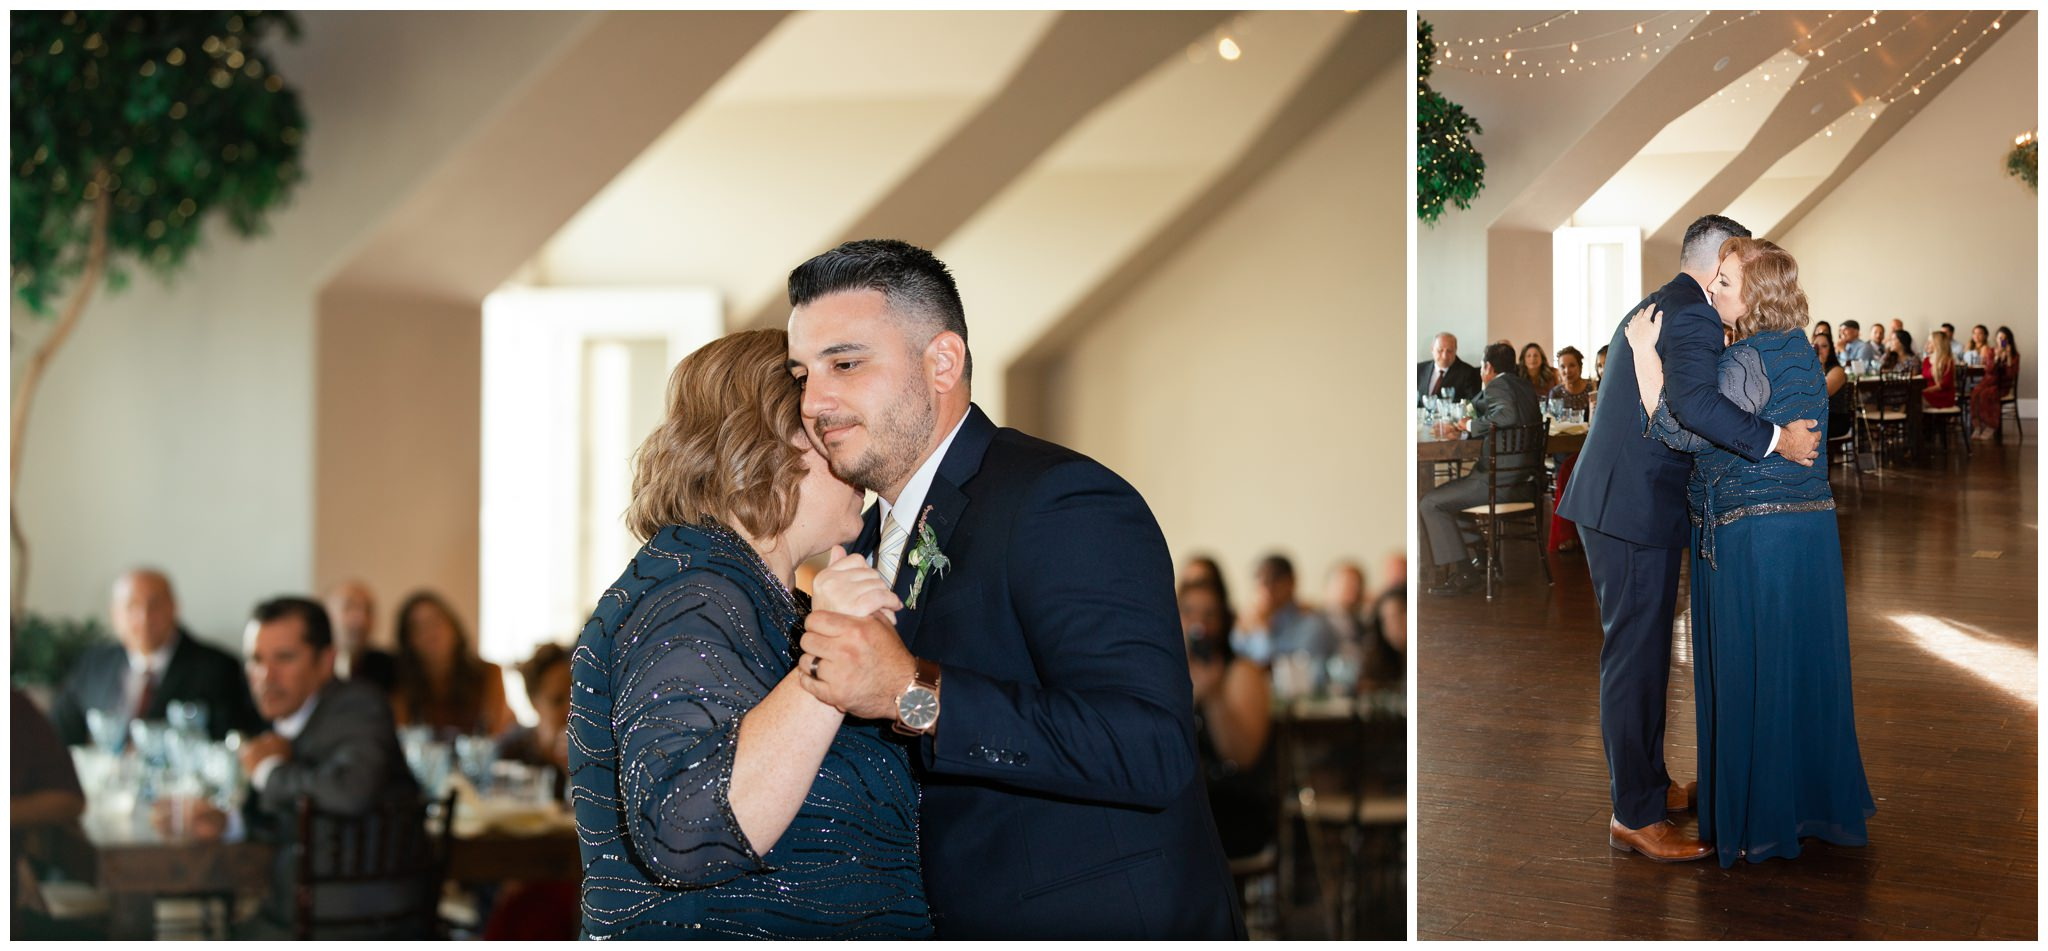 Groom dancing with his mom at Vineyard wedding Venue